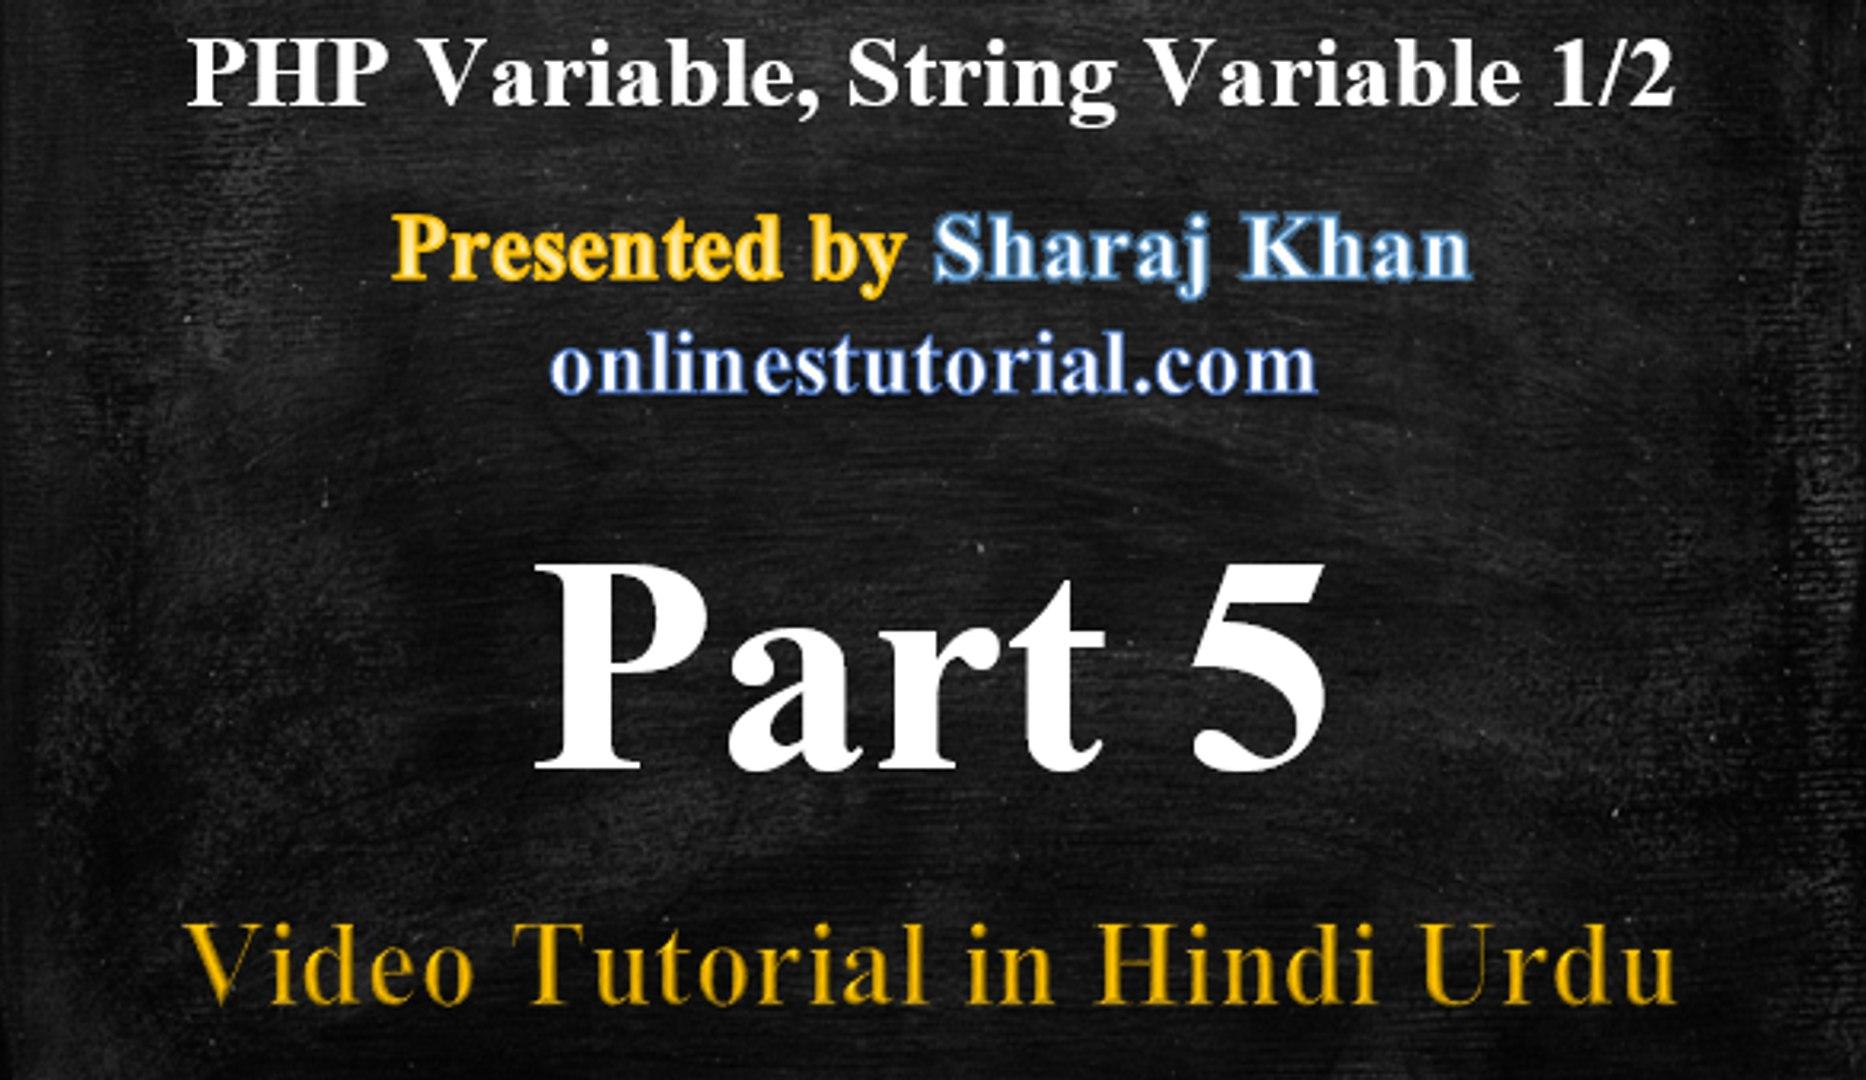 PHP Tutorial in Hindi-Urdu 5-Introduction Variable, String Variable 1/2